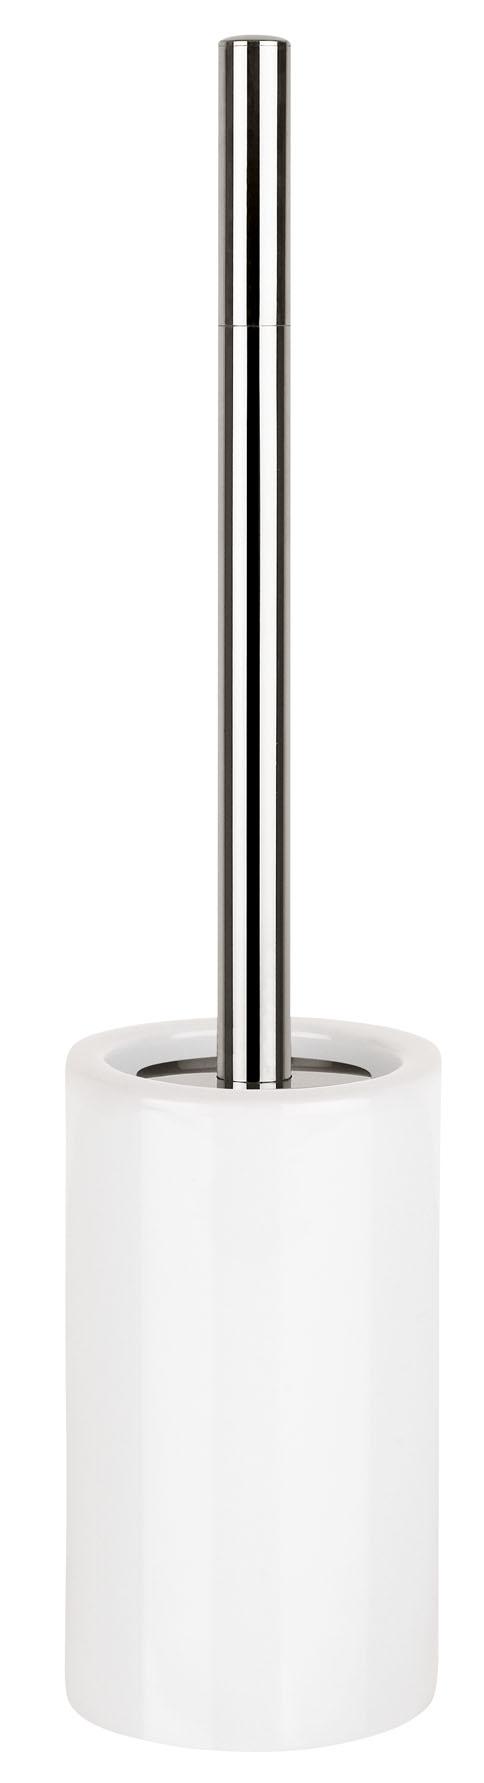 Spirella 10.15999 Tube WC-kefe fehér